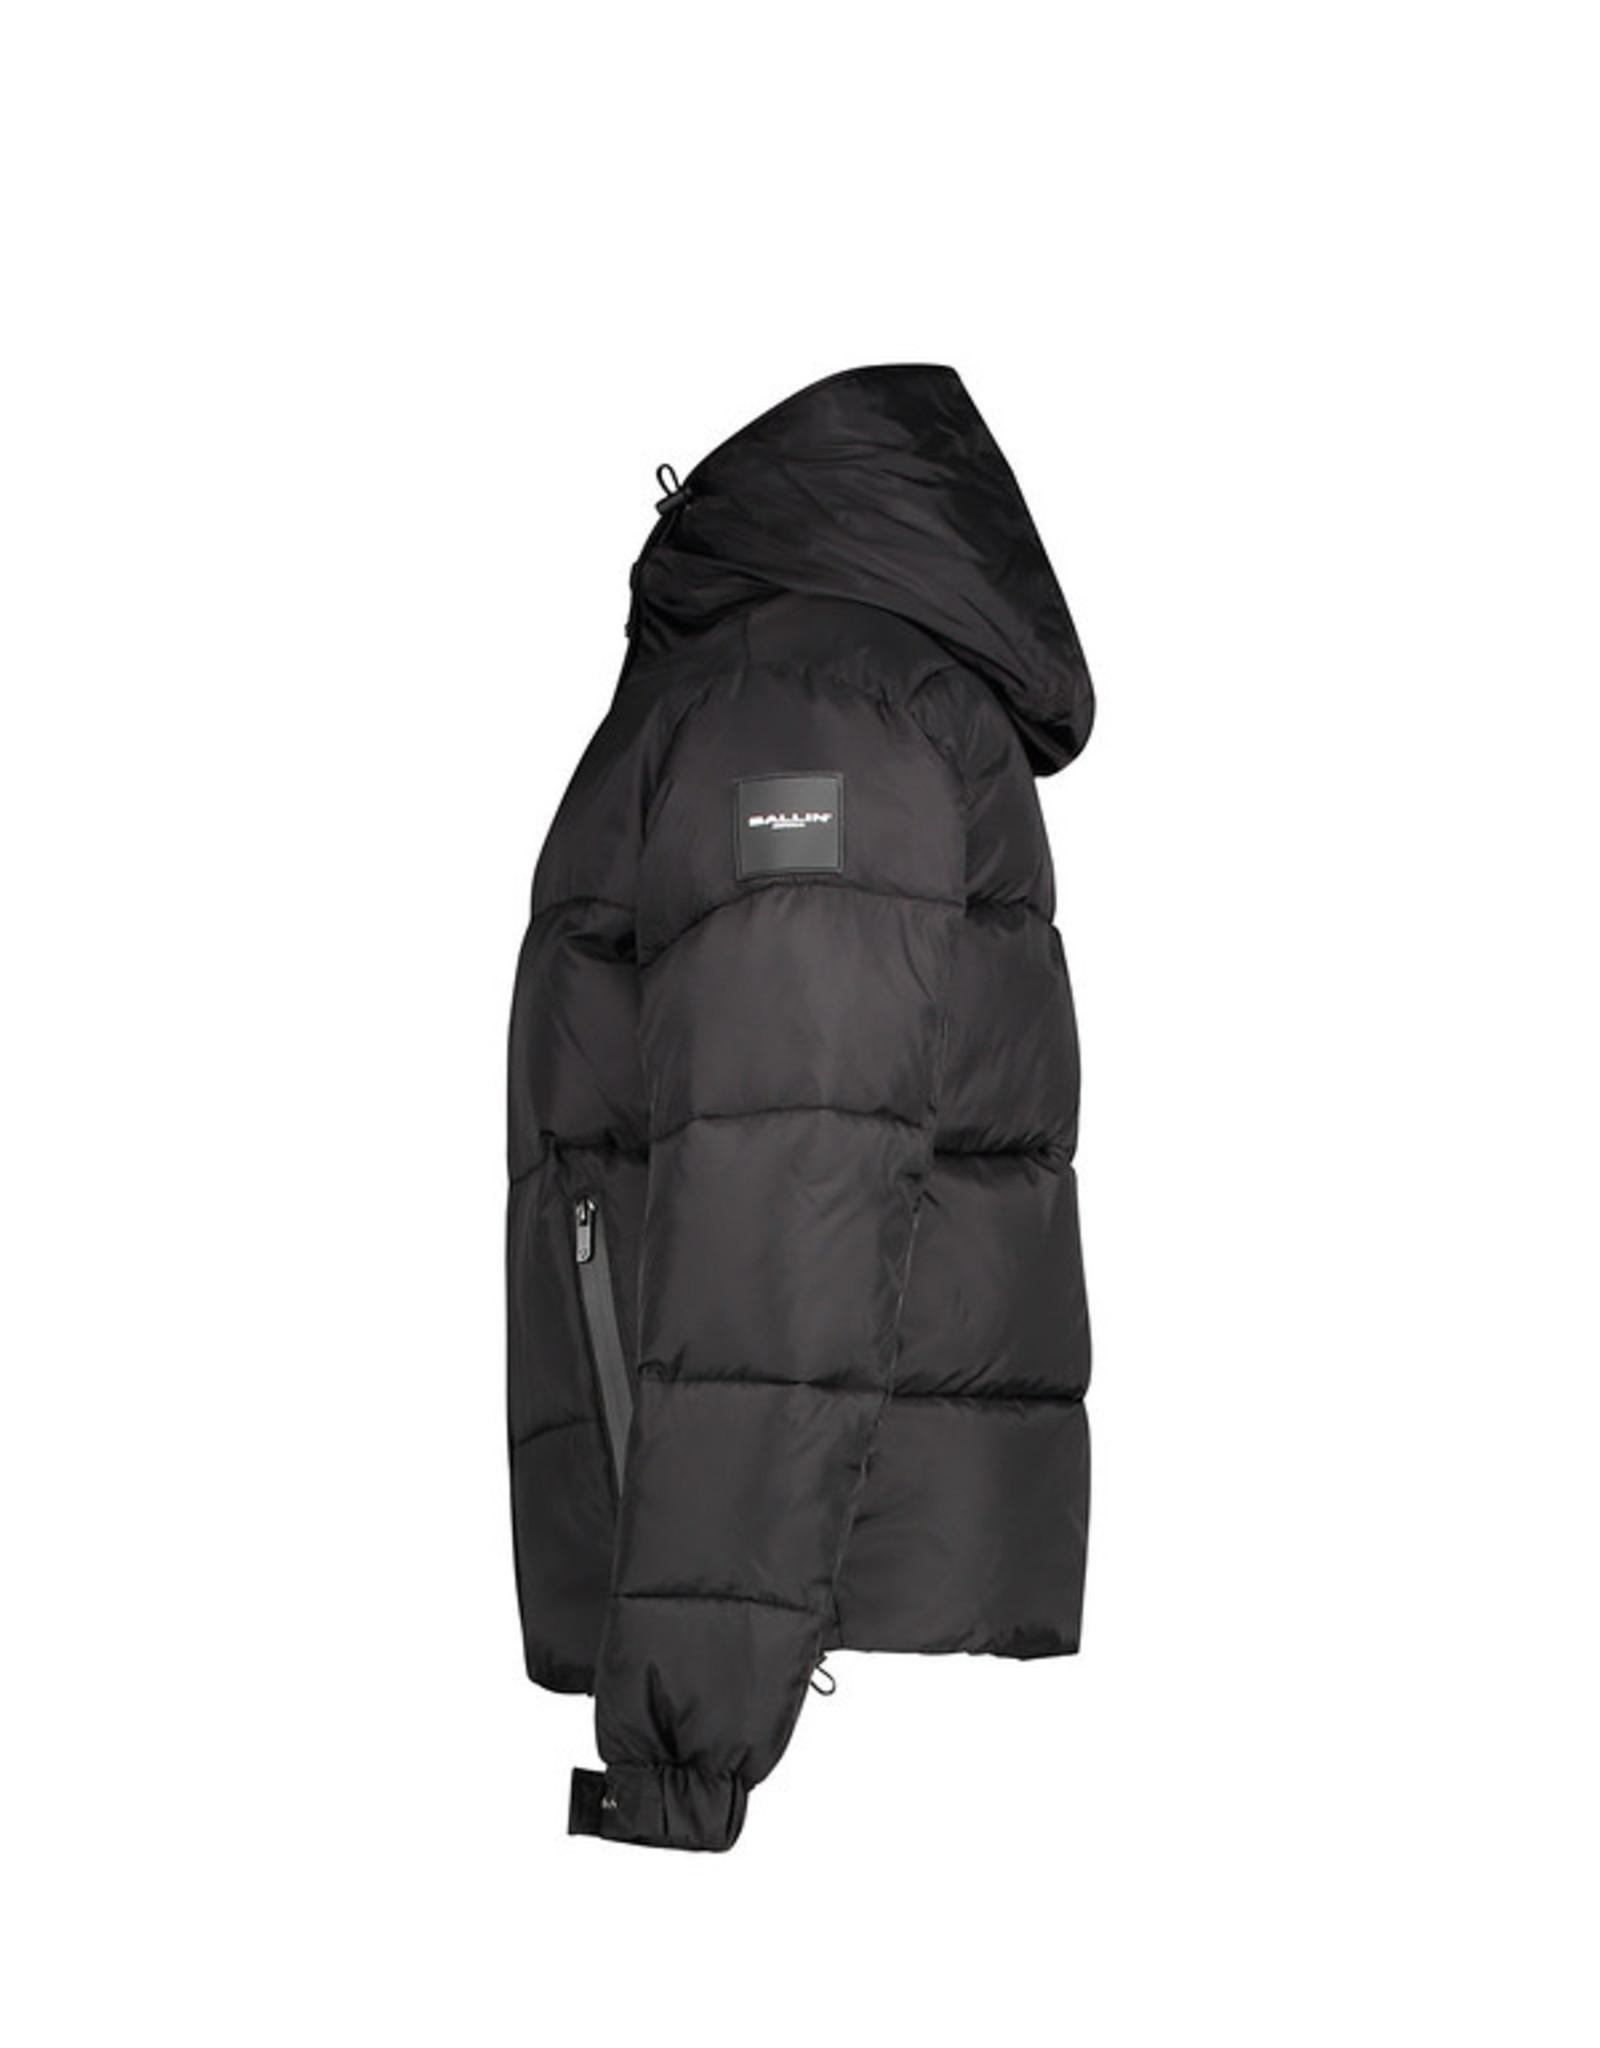 Ballin Amsterdam Jacket 02 Black